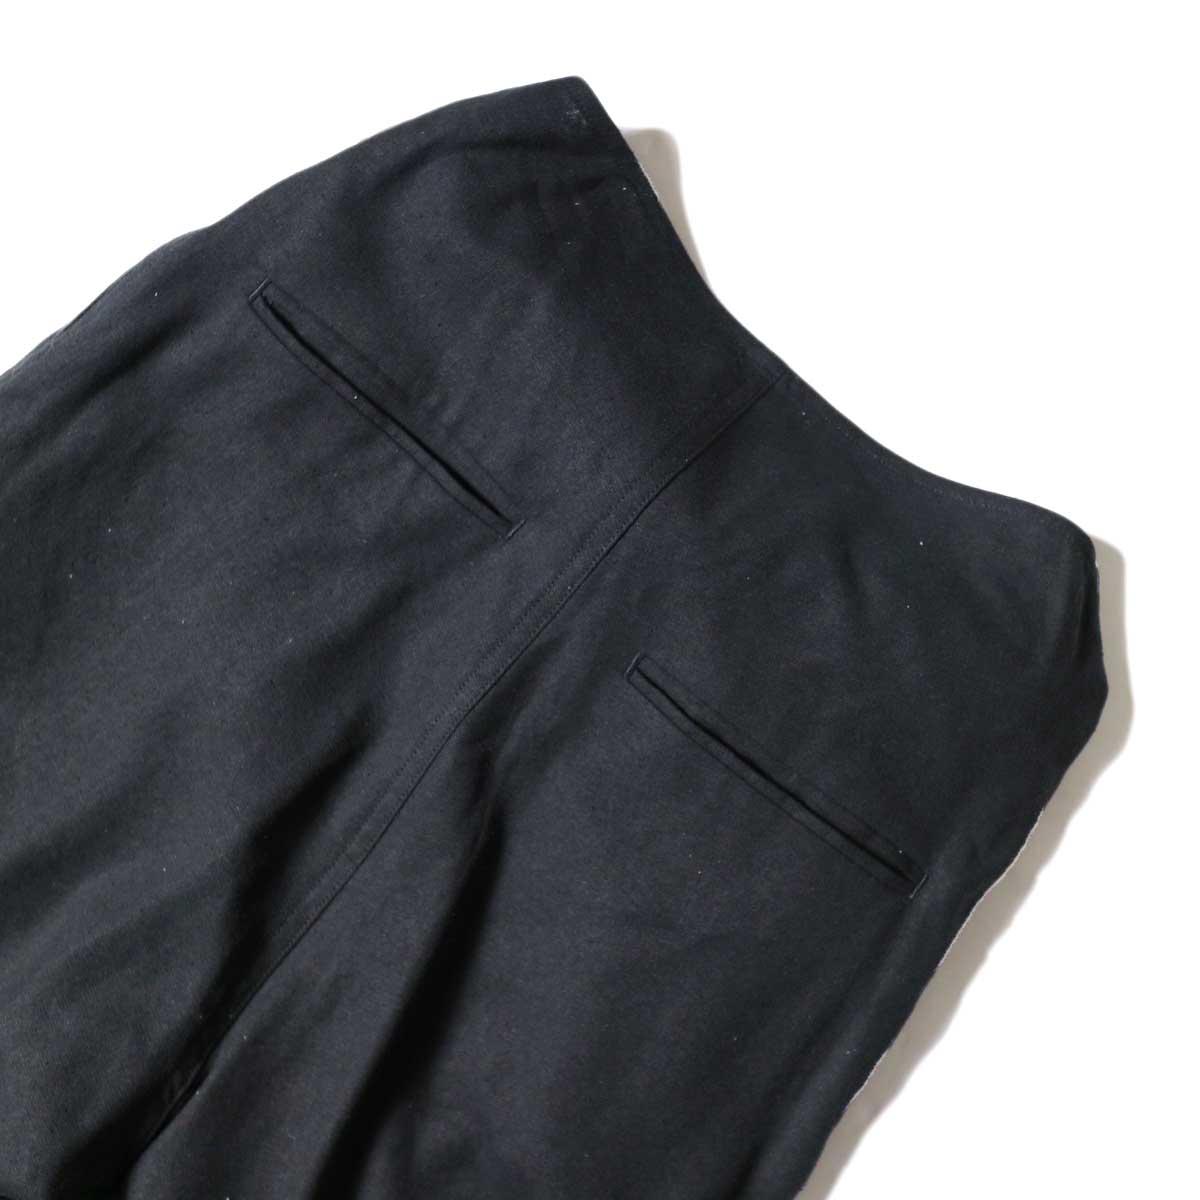 ARCHI / S/L NEP WRAP SLACKS (Black) ウエスト背面②